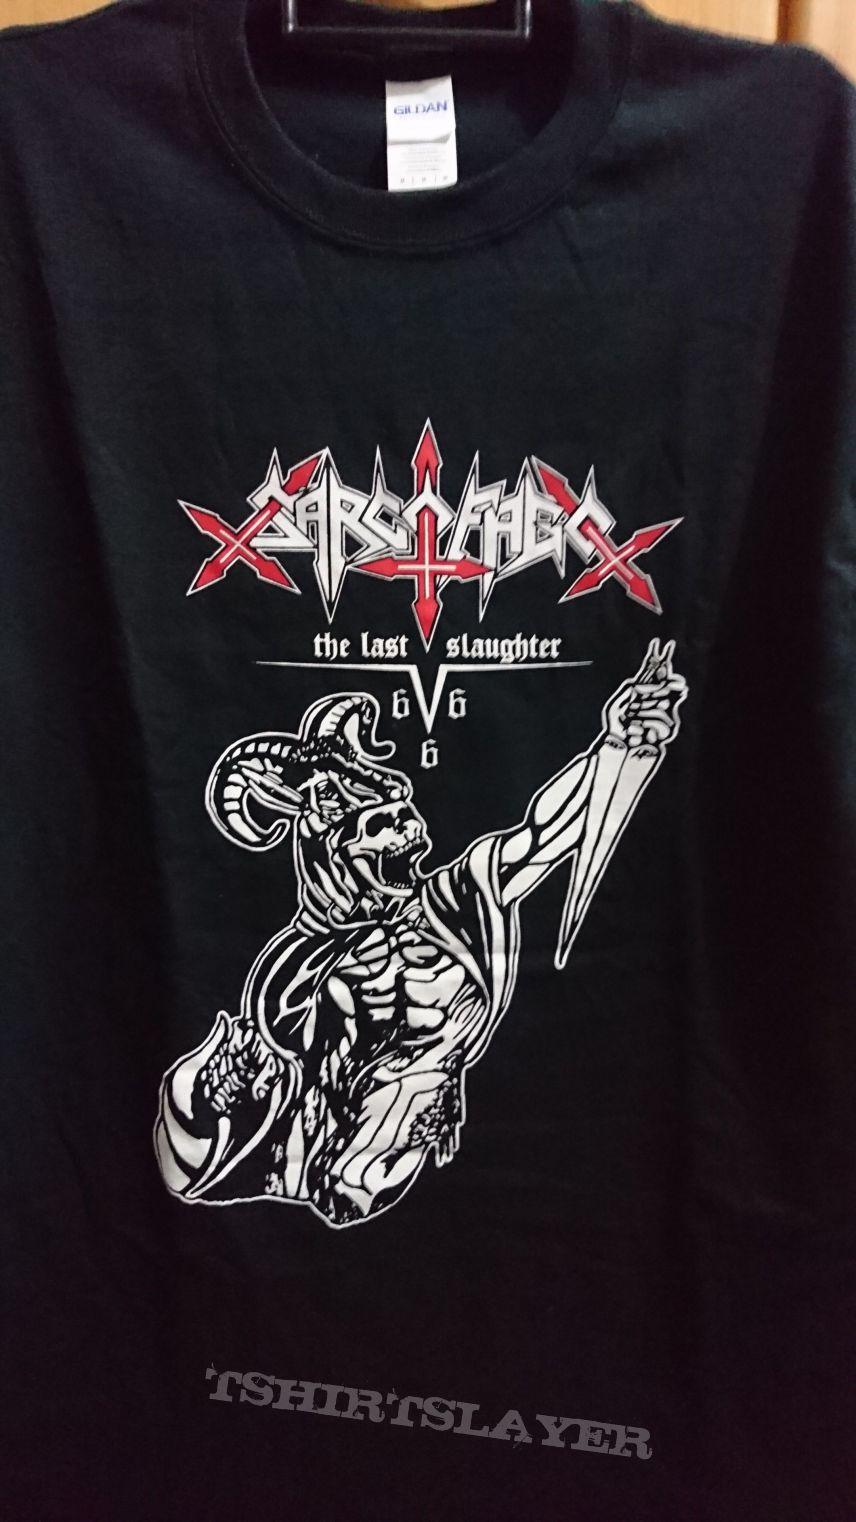 Sarcofago - The Last Slaughter